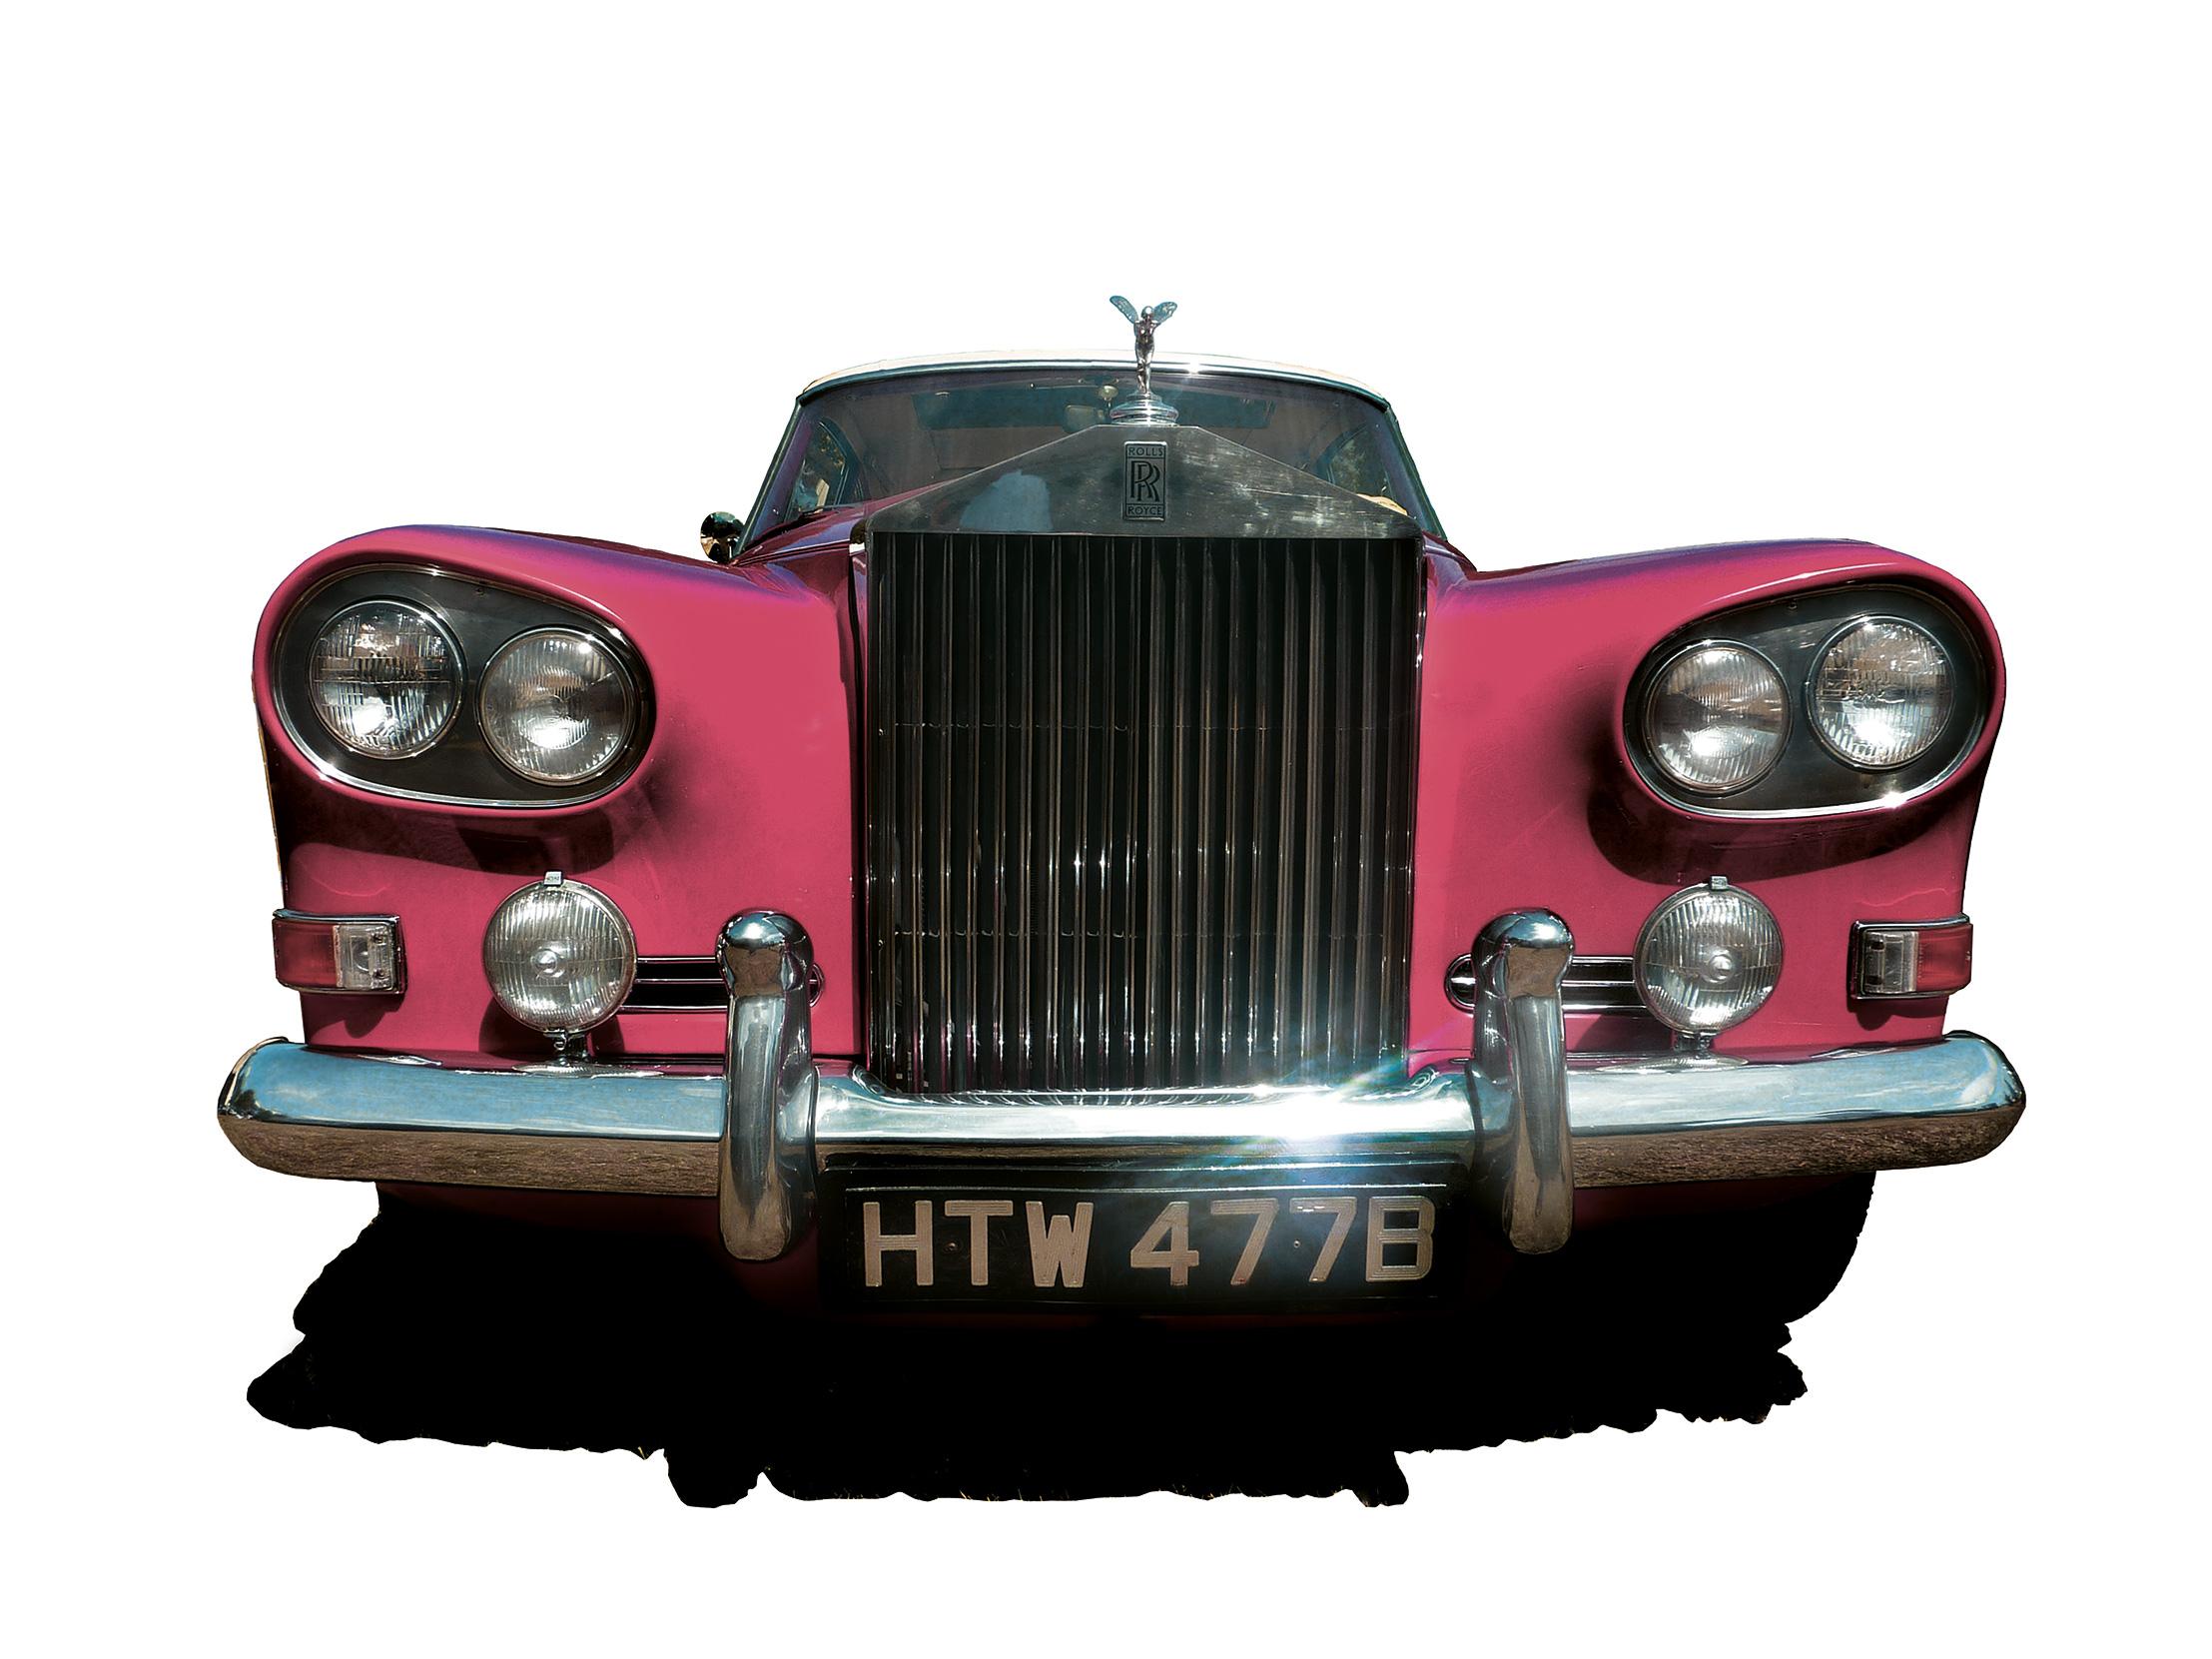 Phantom RR Classic cars